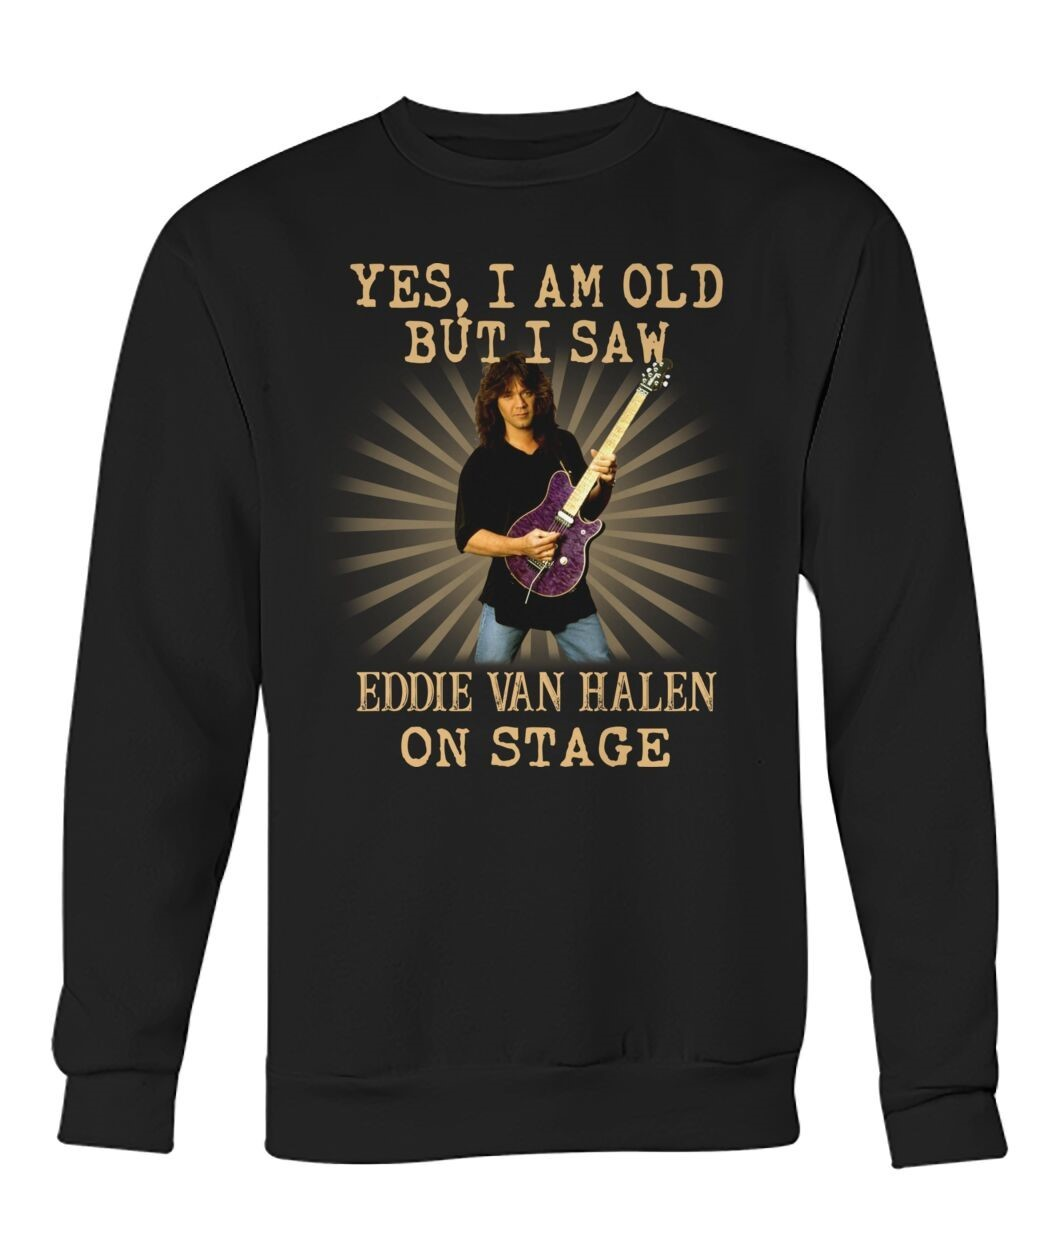 Yes I Am Old But I Saw Eddie Van Halen On Stage Shirt